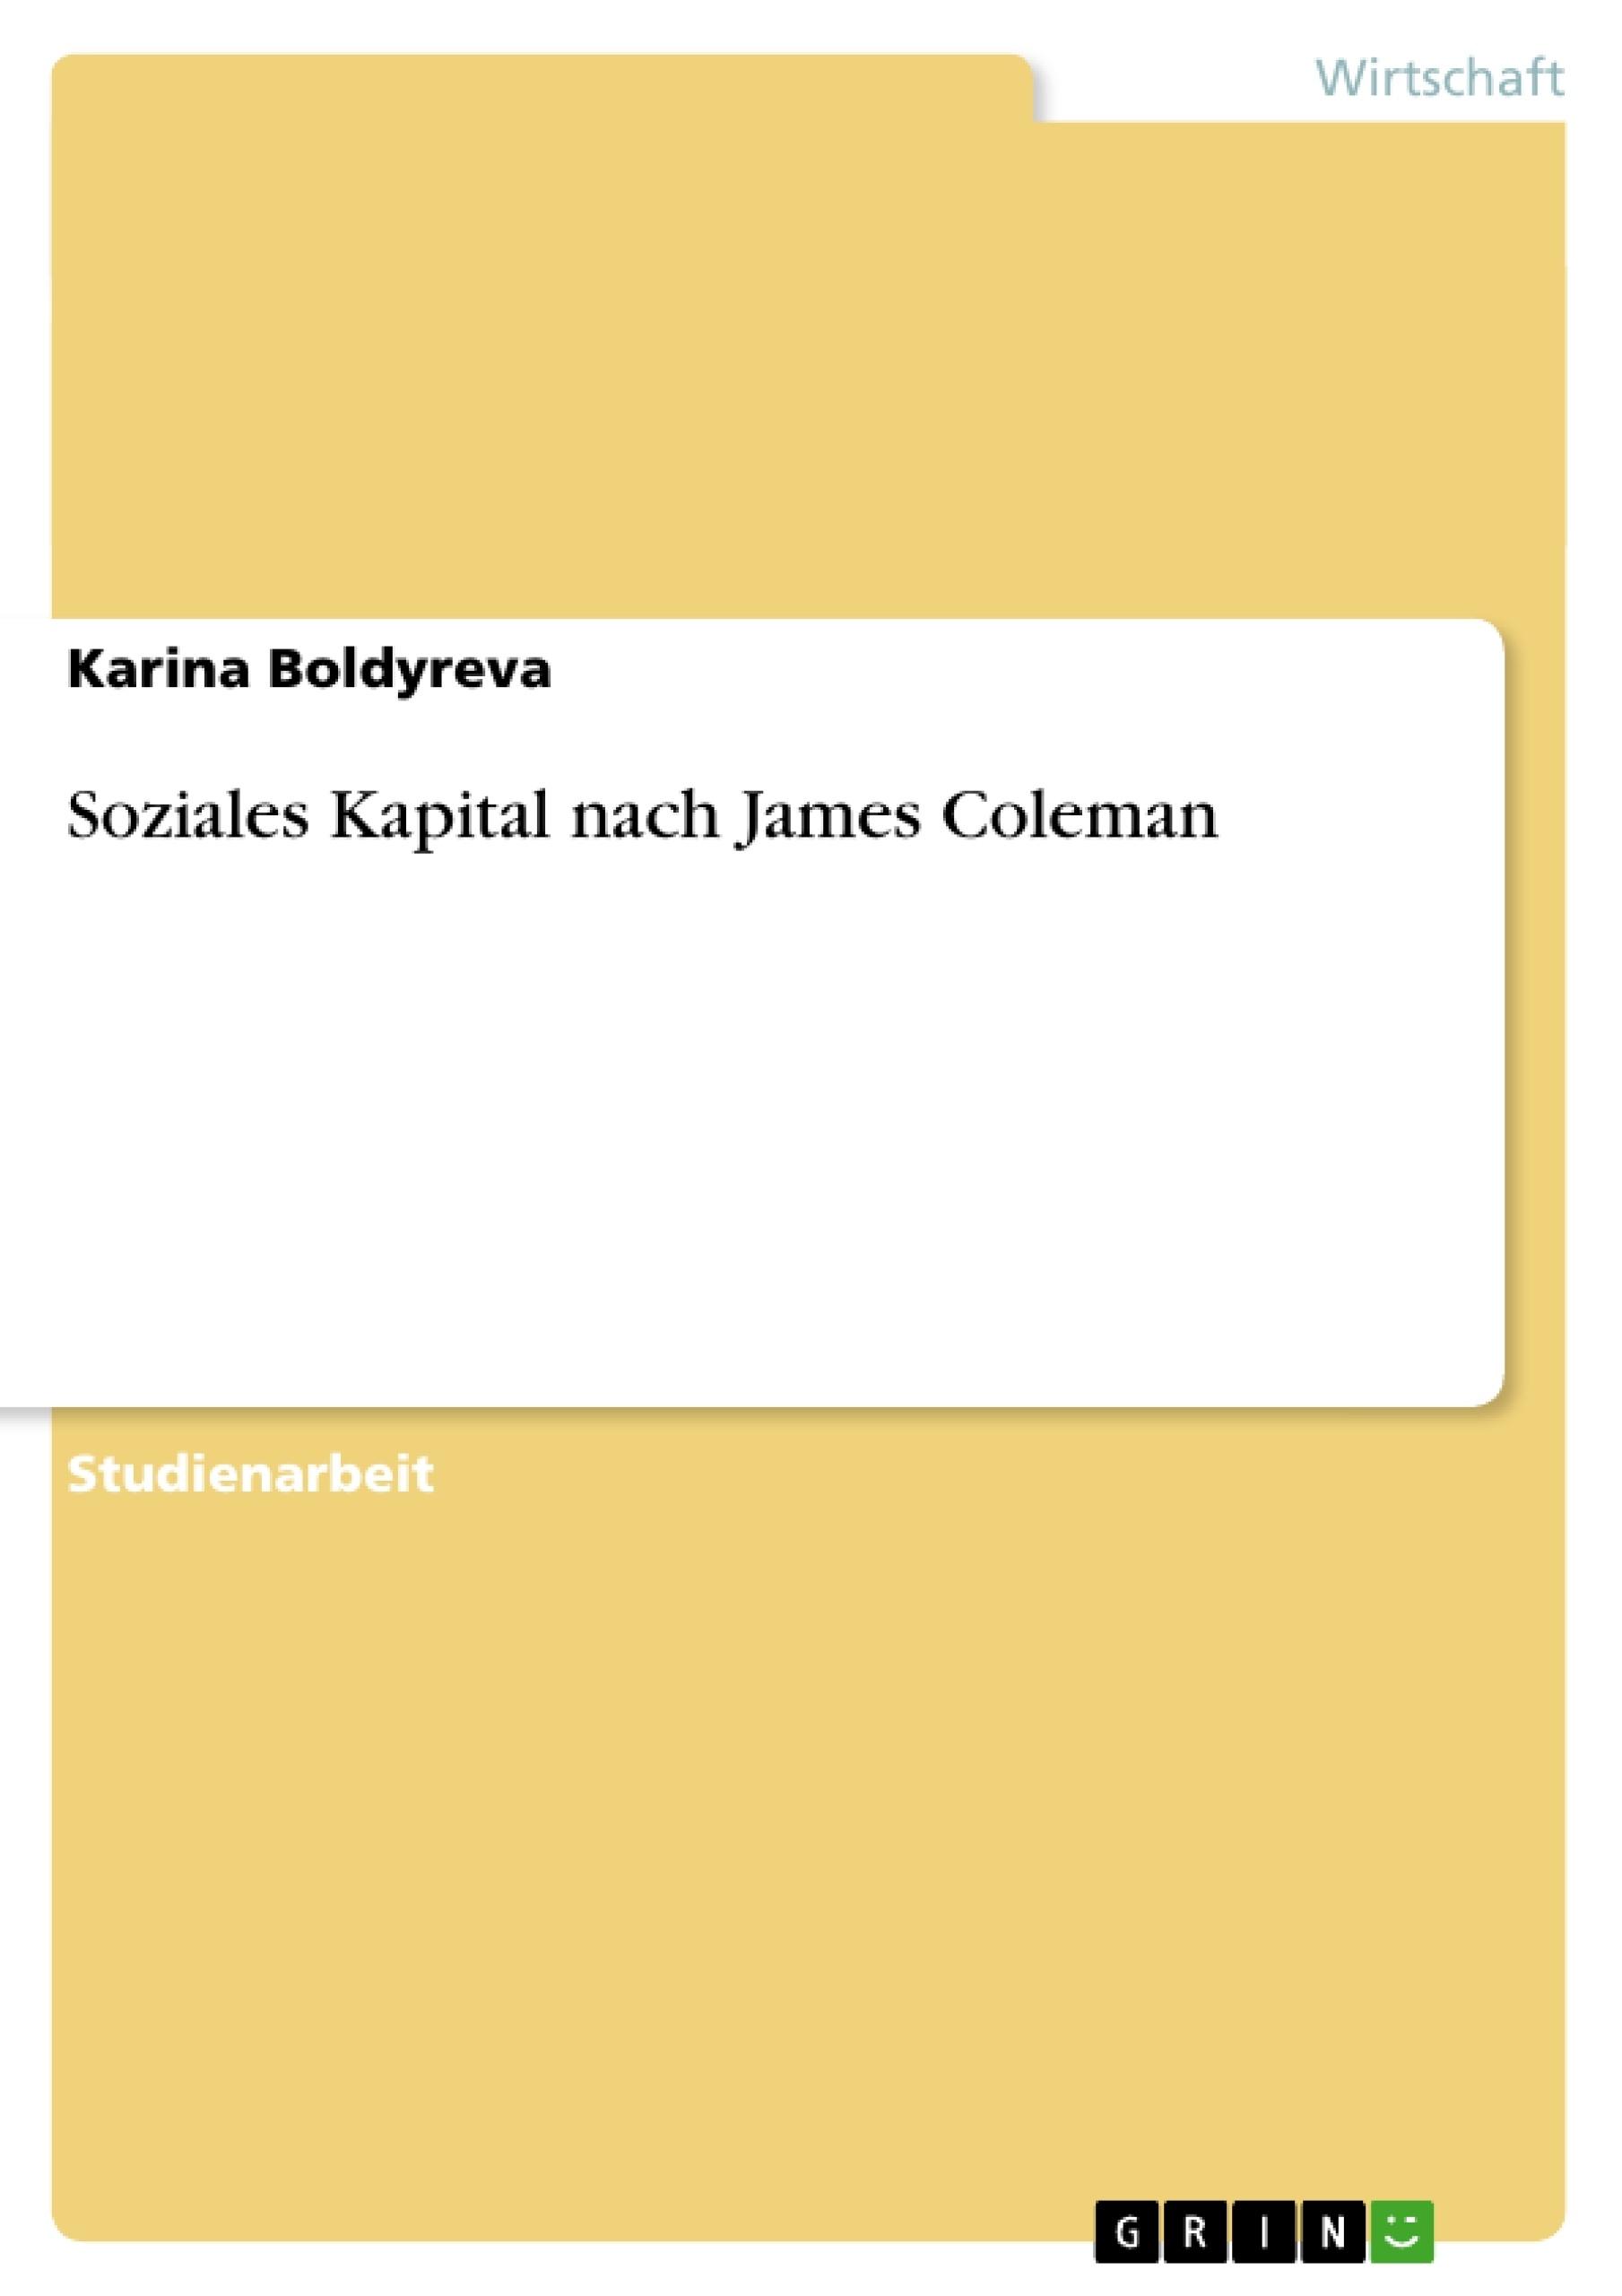 Titel: Soziales Kapital nach James Coleman